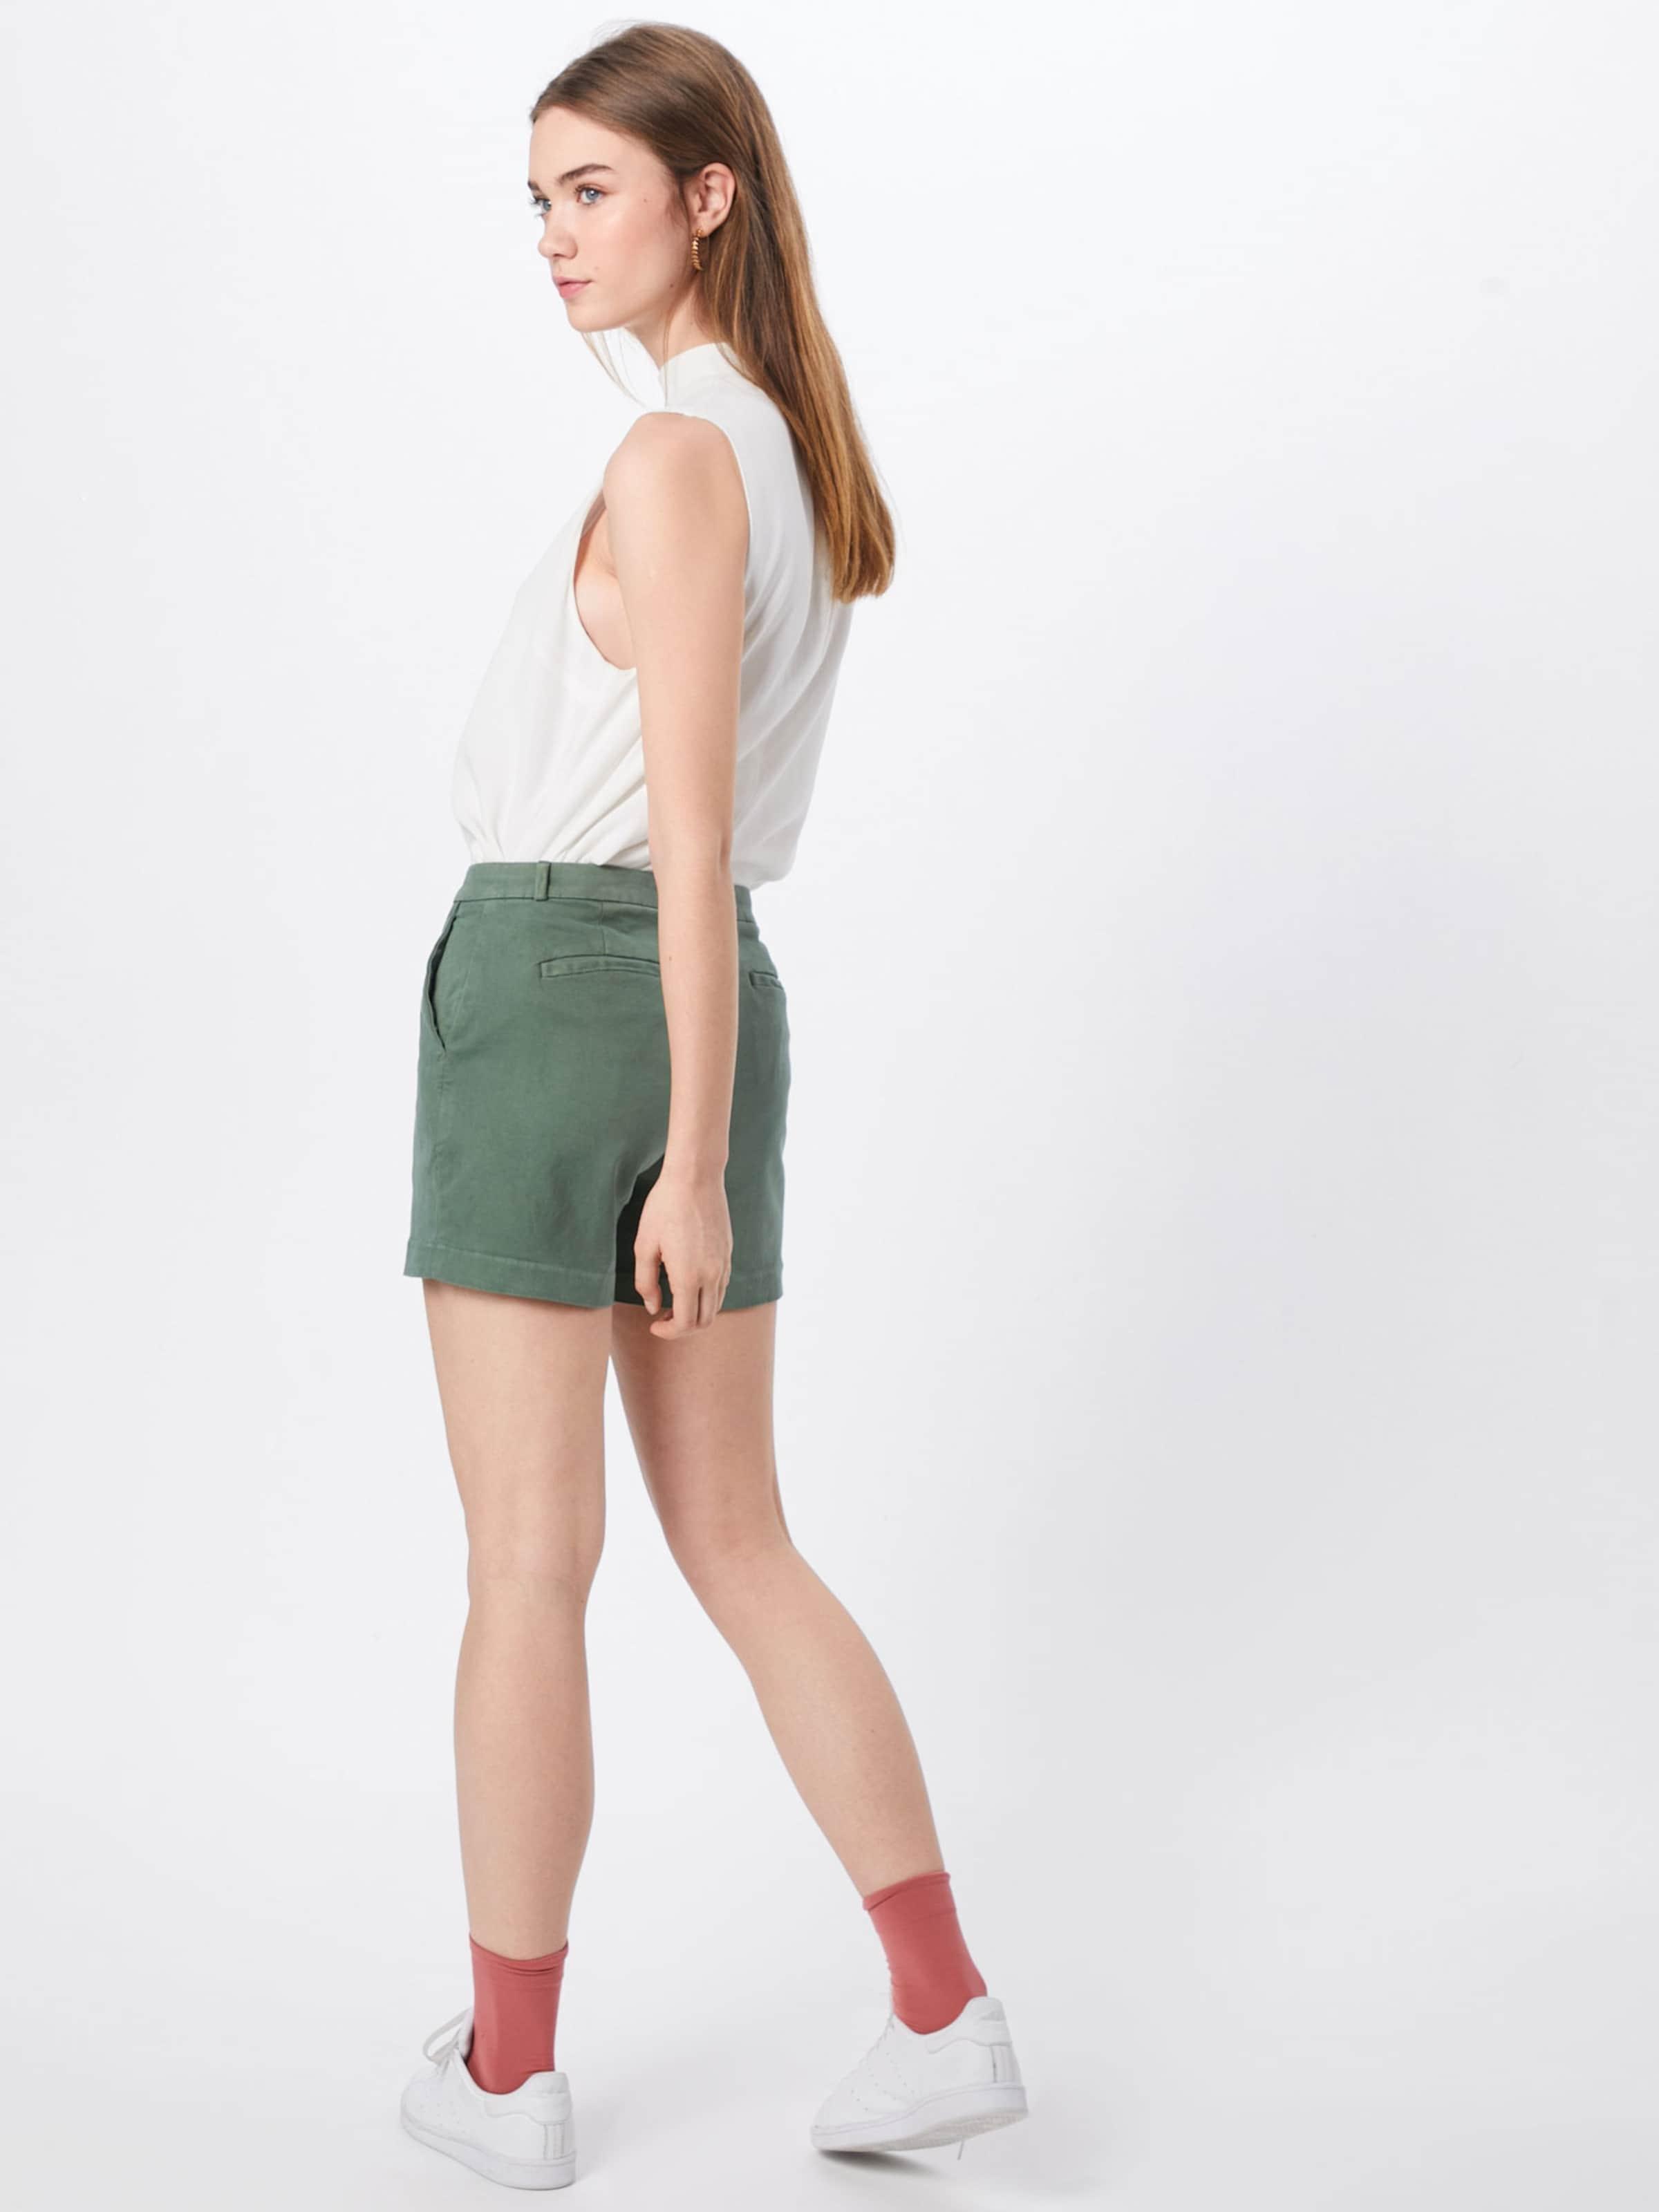 Shorts In Republic '5 Banana Inch Chino' Oliv EH29WDI